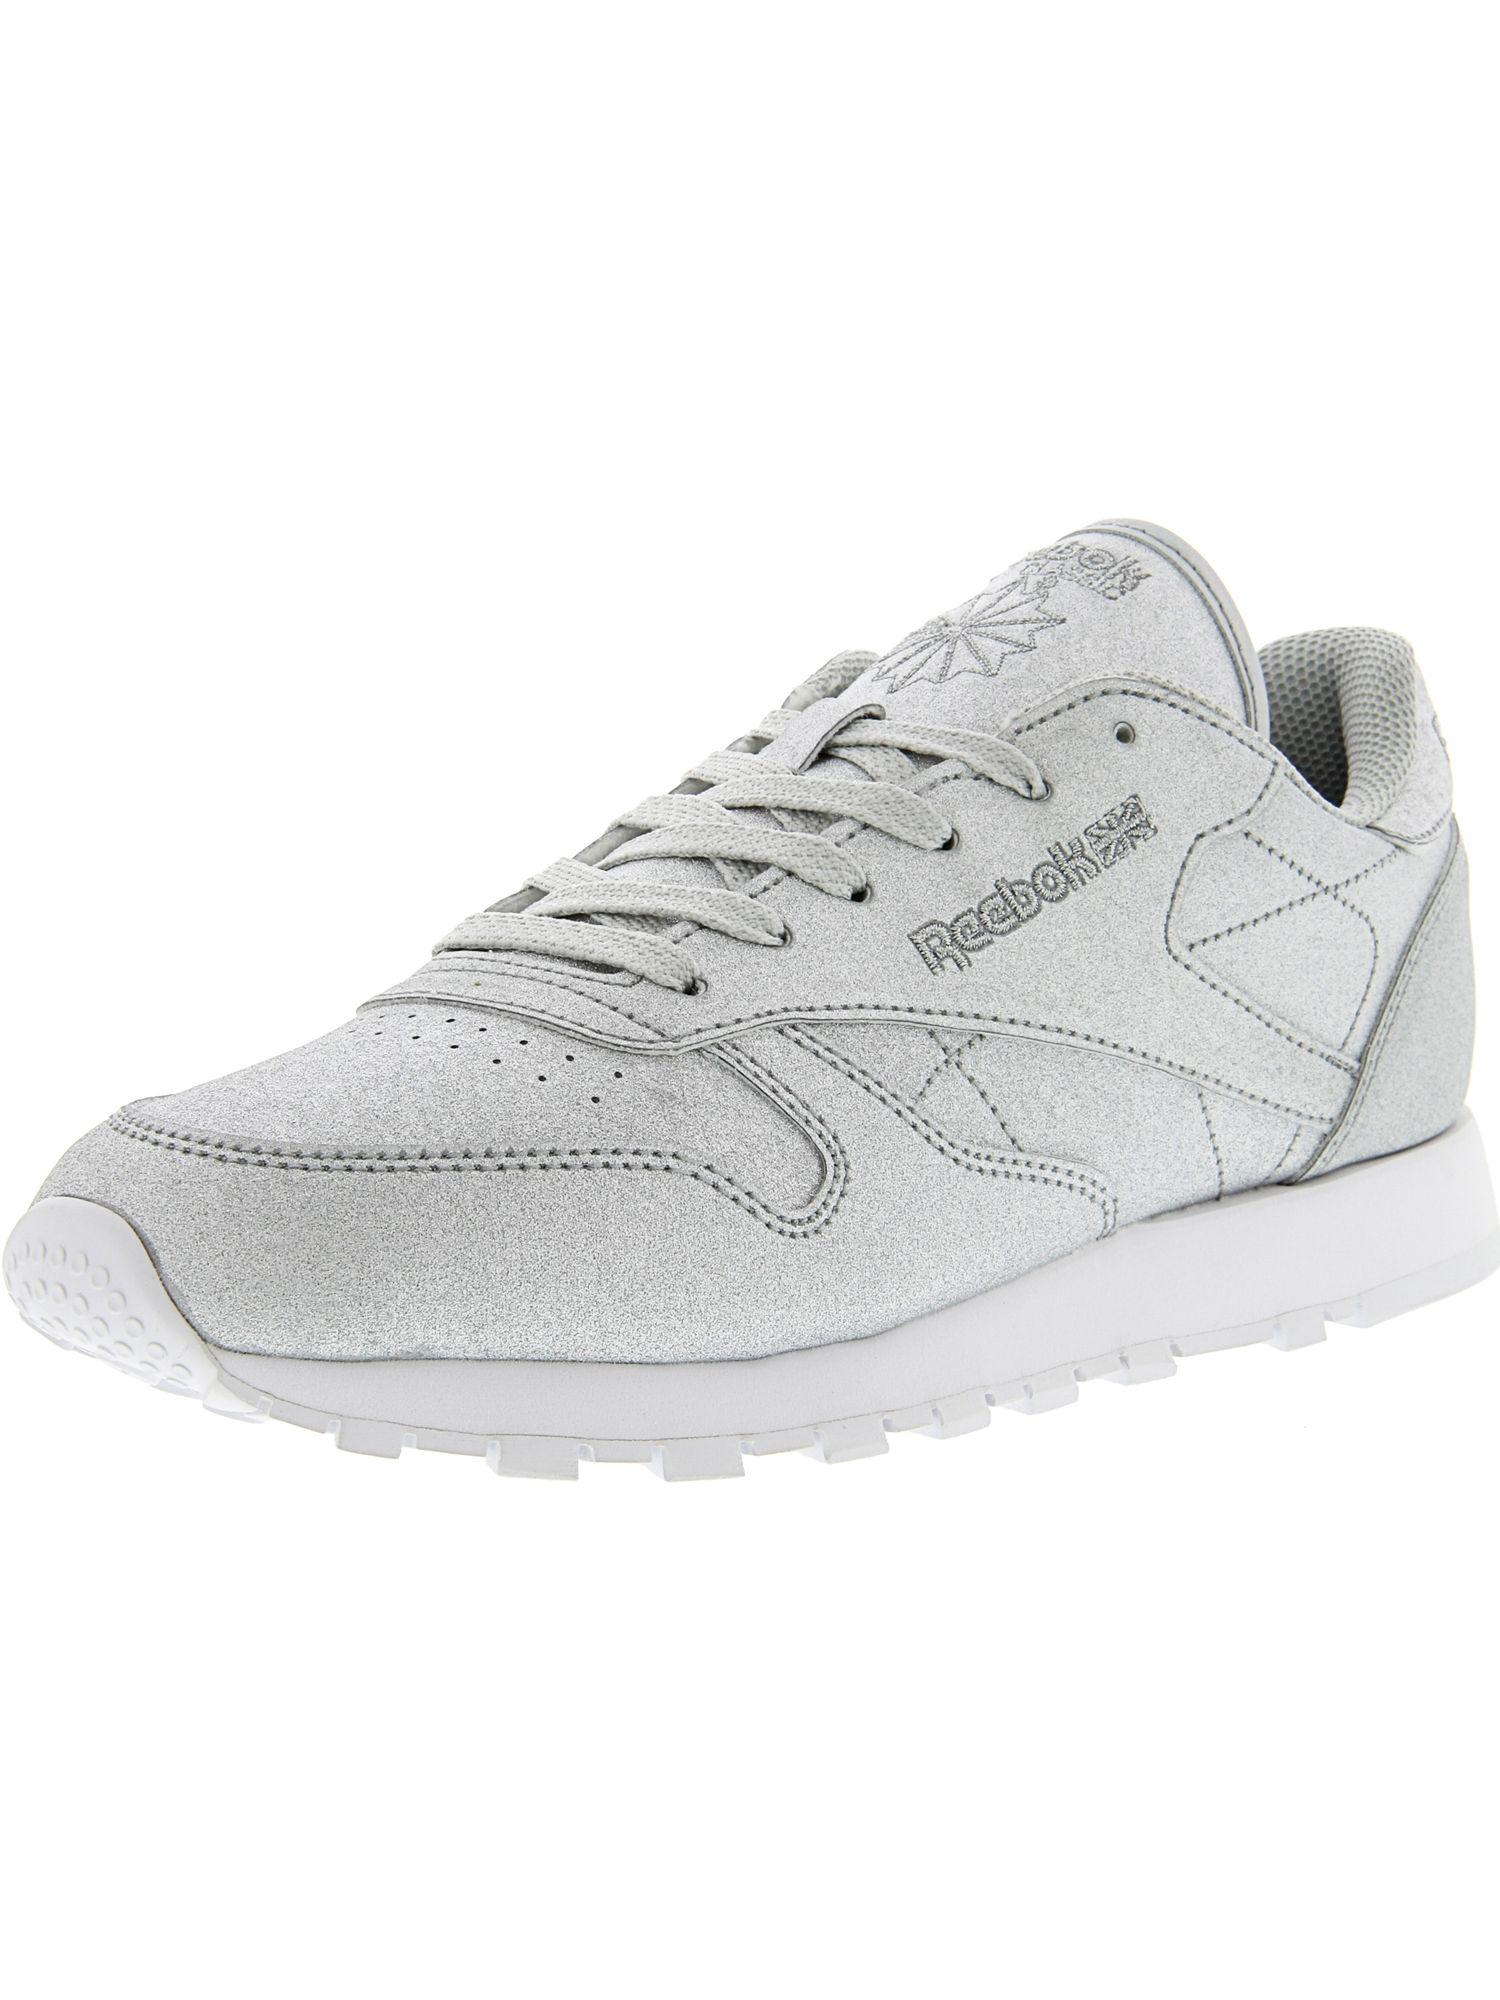 5b6c005a3f1 Lyst - Reebok Women s Cl Leather Syn Ankle-high Fashion Sneaker